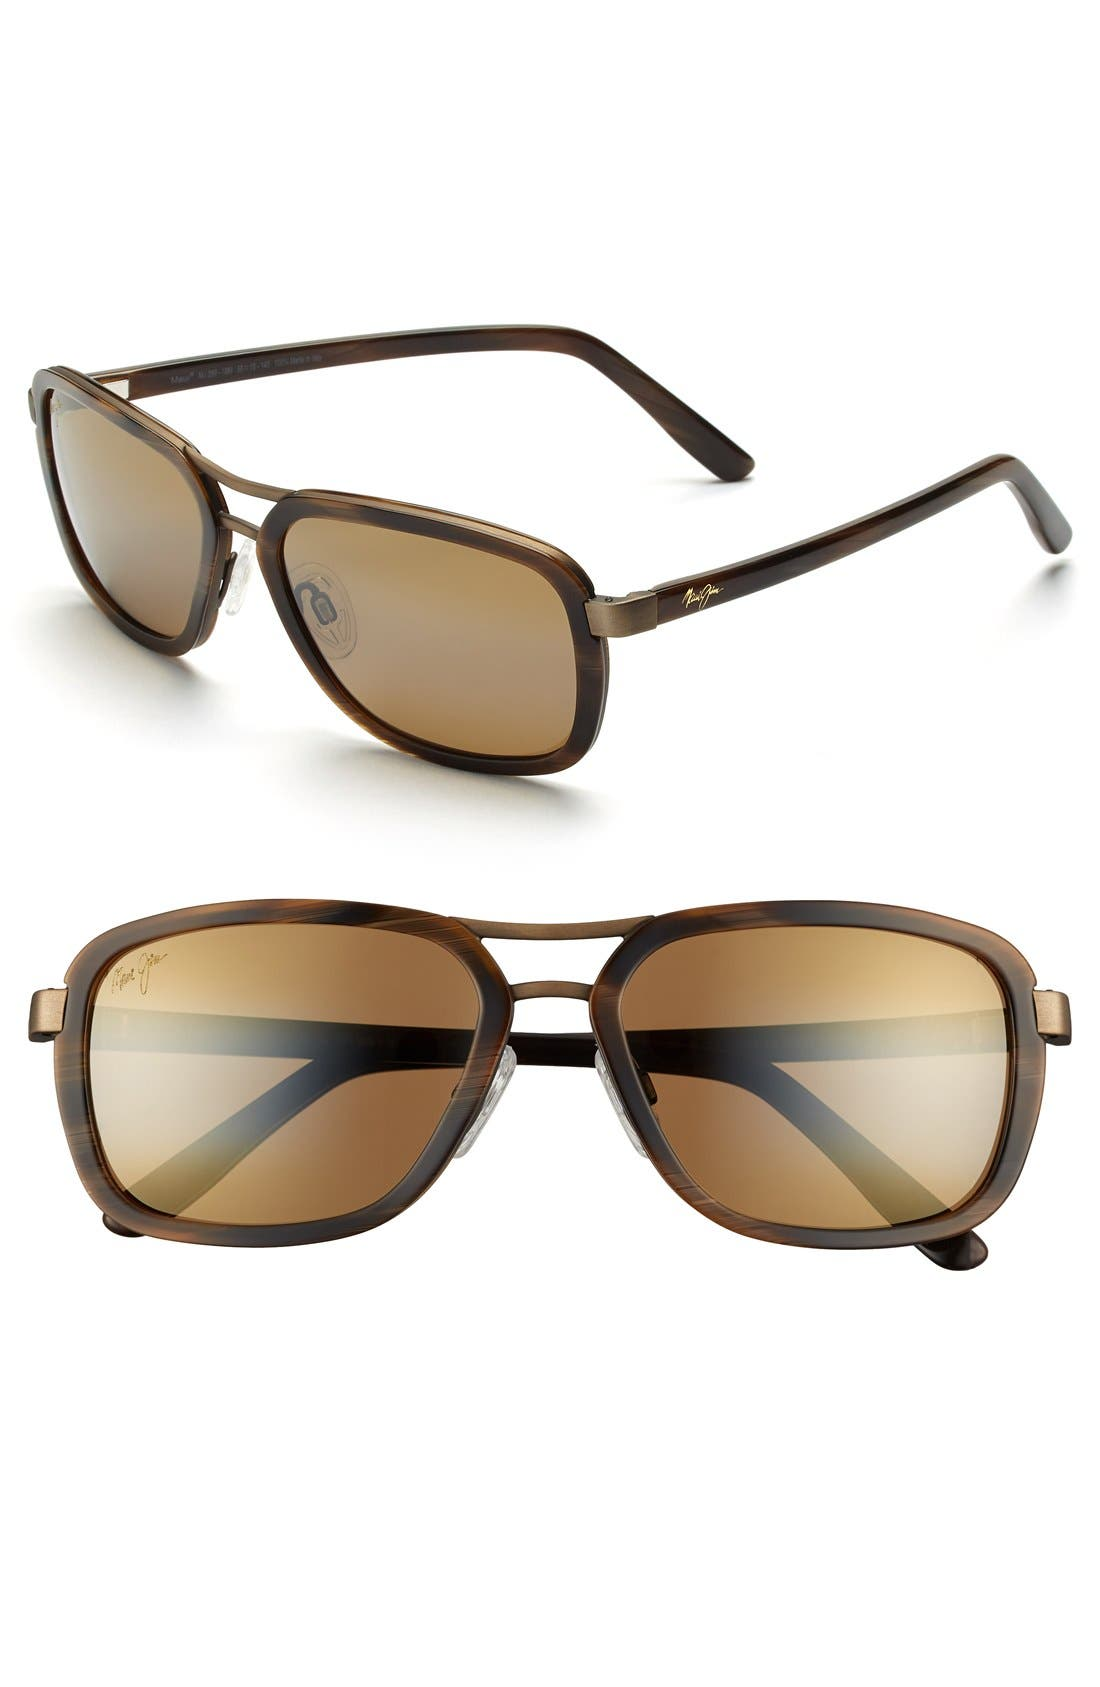 Main Image - Maui Jim 'Wanderer' 58mm Polarized Aviator Sunglasses